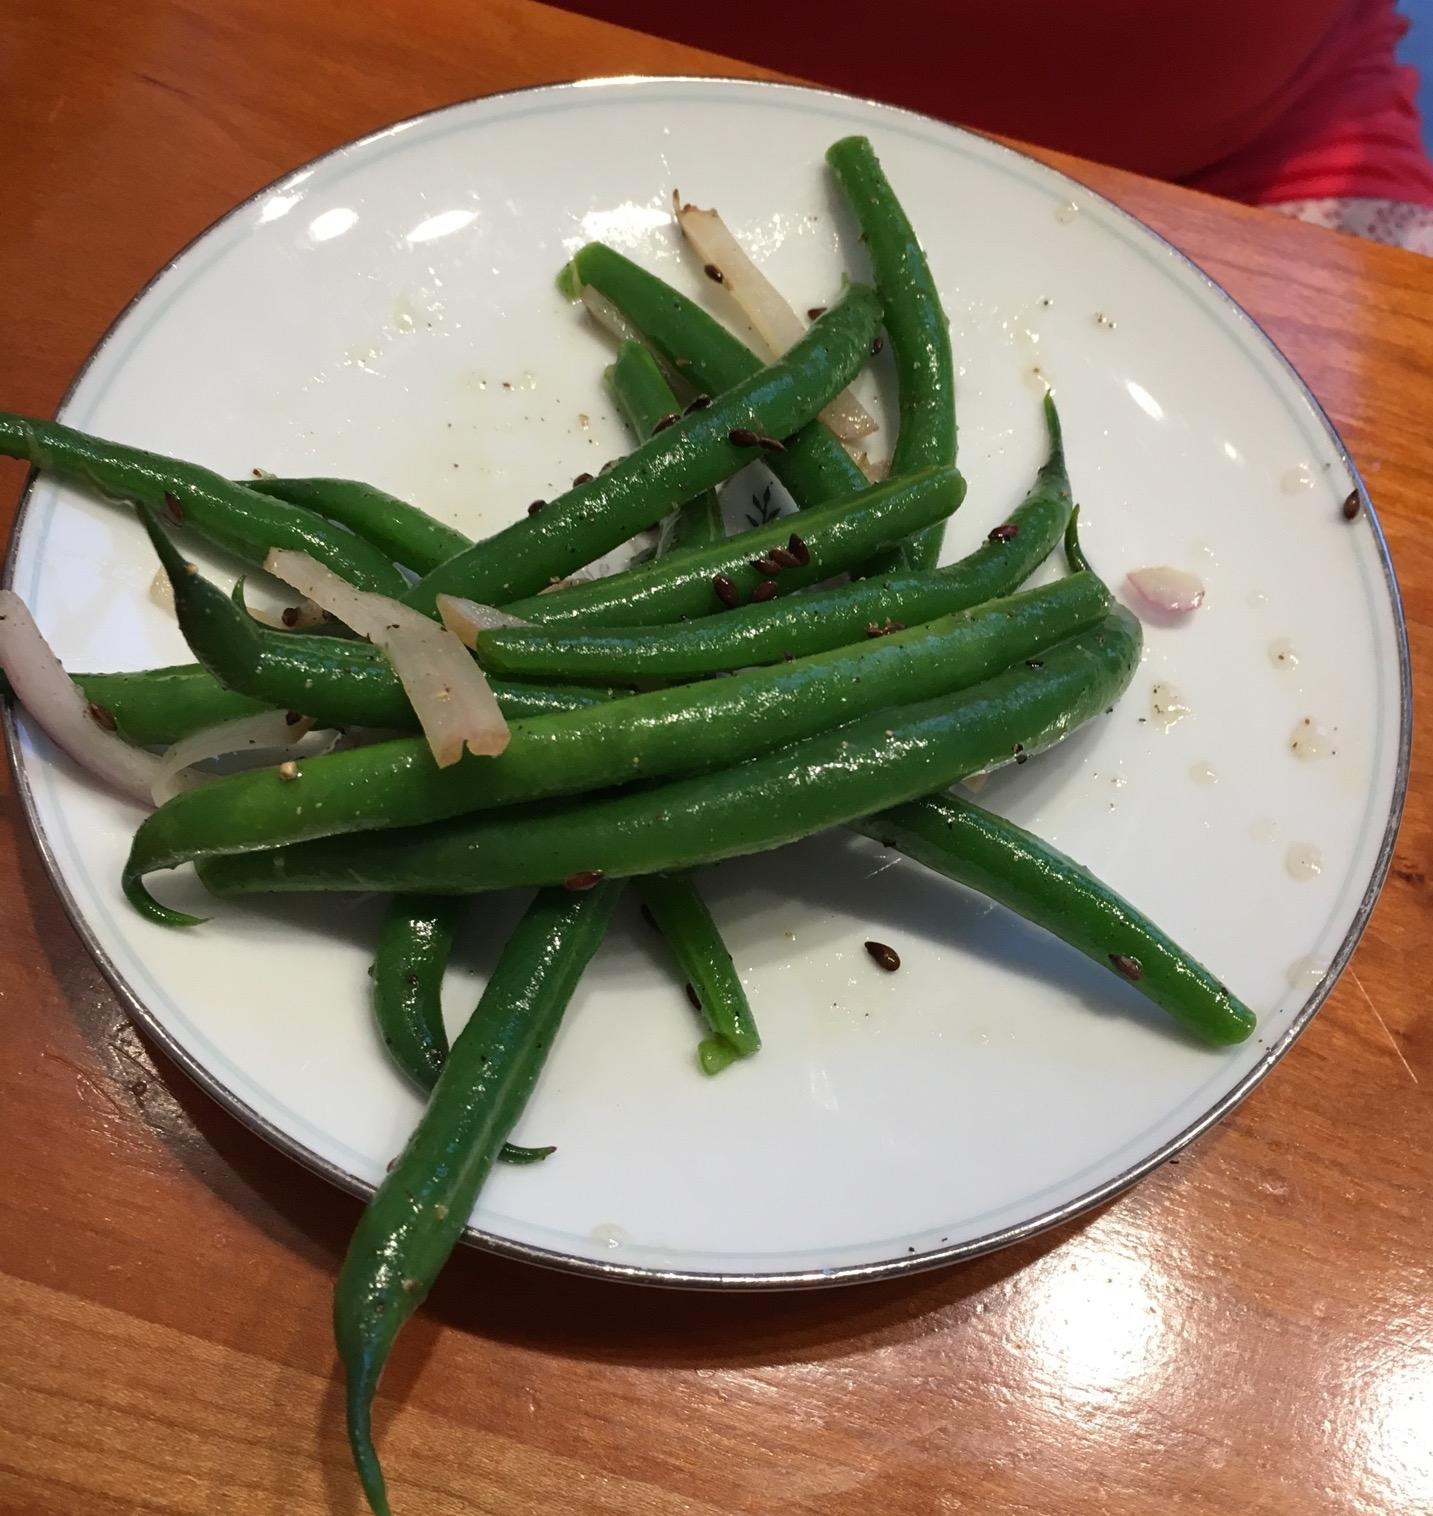 A terrible photo of the Green Bean Salad.